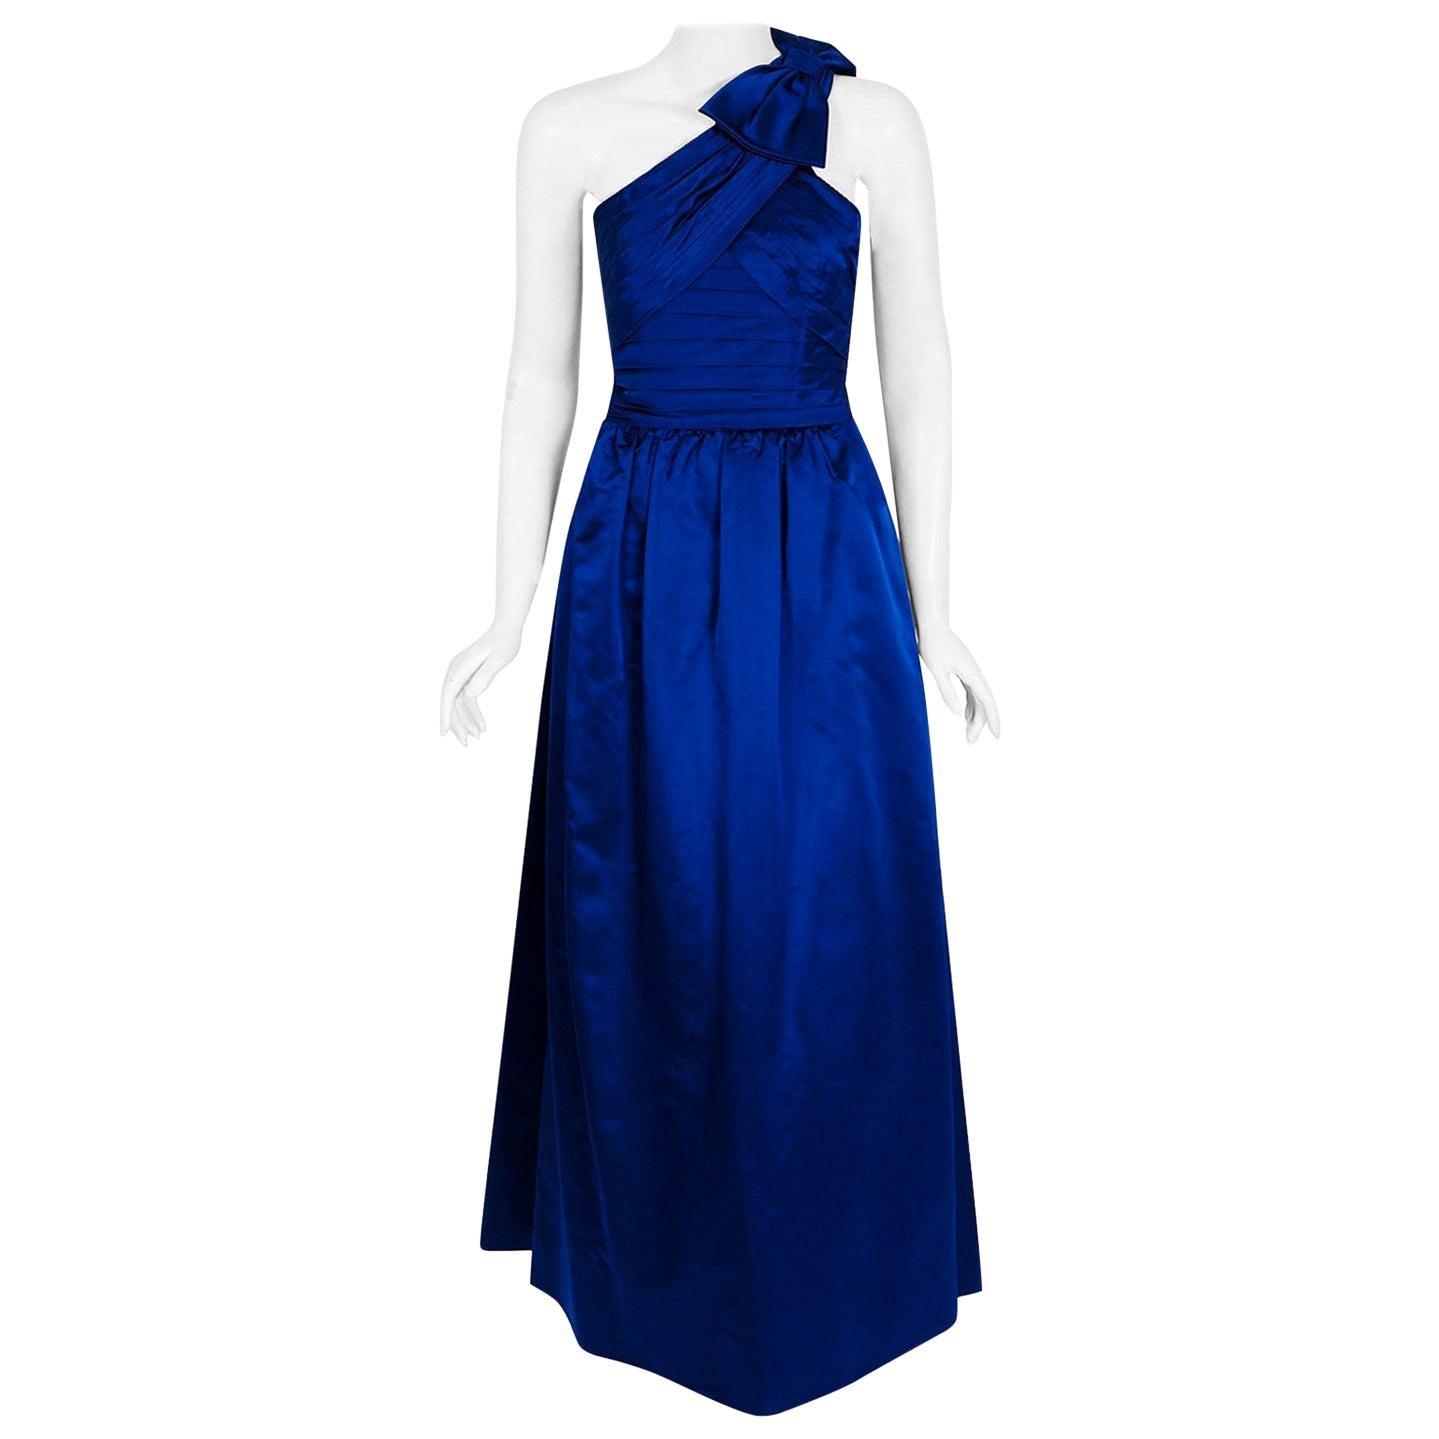 Vintage 1950's Sapphire Blue Satin Asymmetric Pleated One-Shoulder Evening Gown